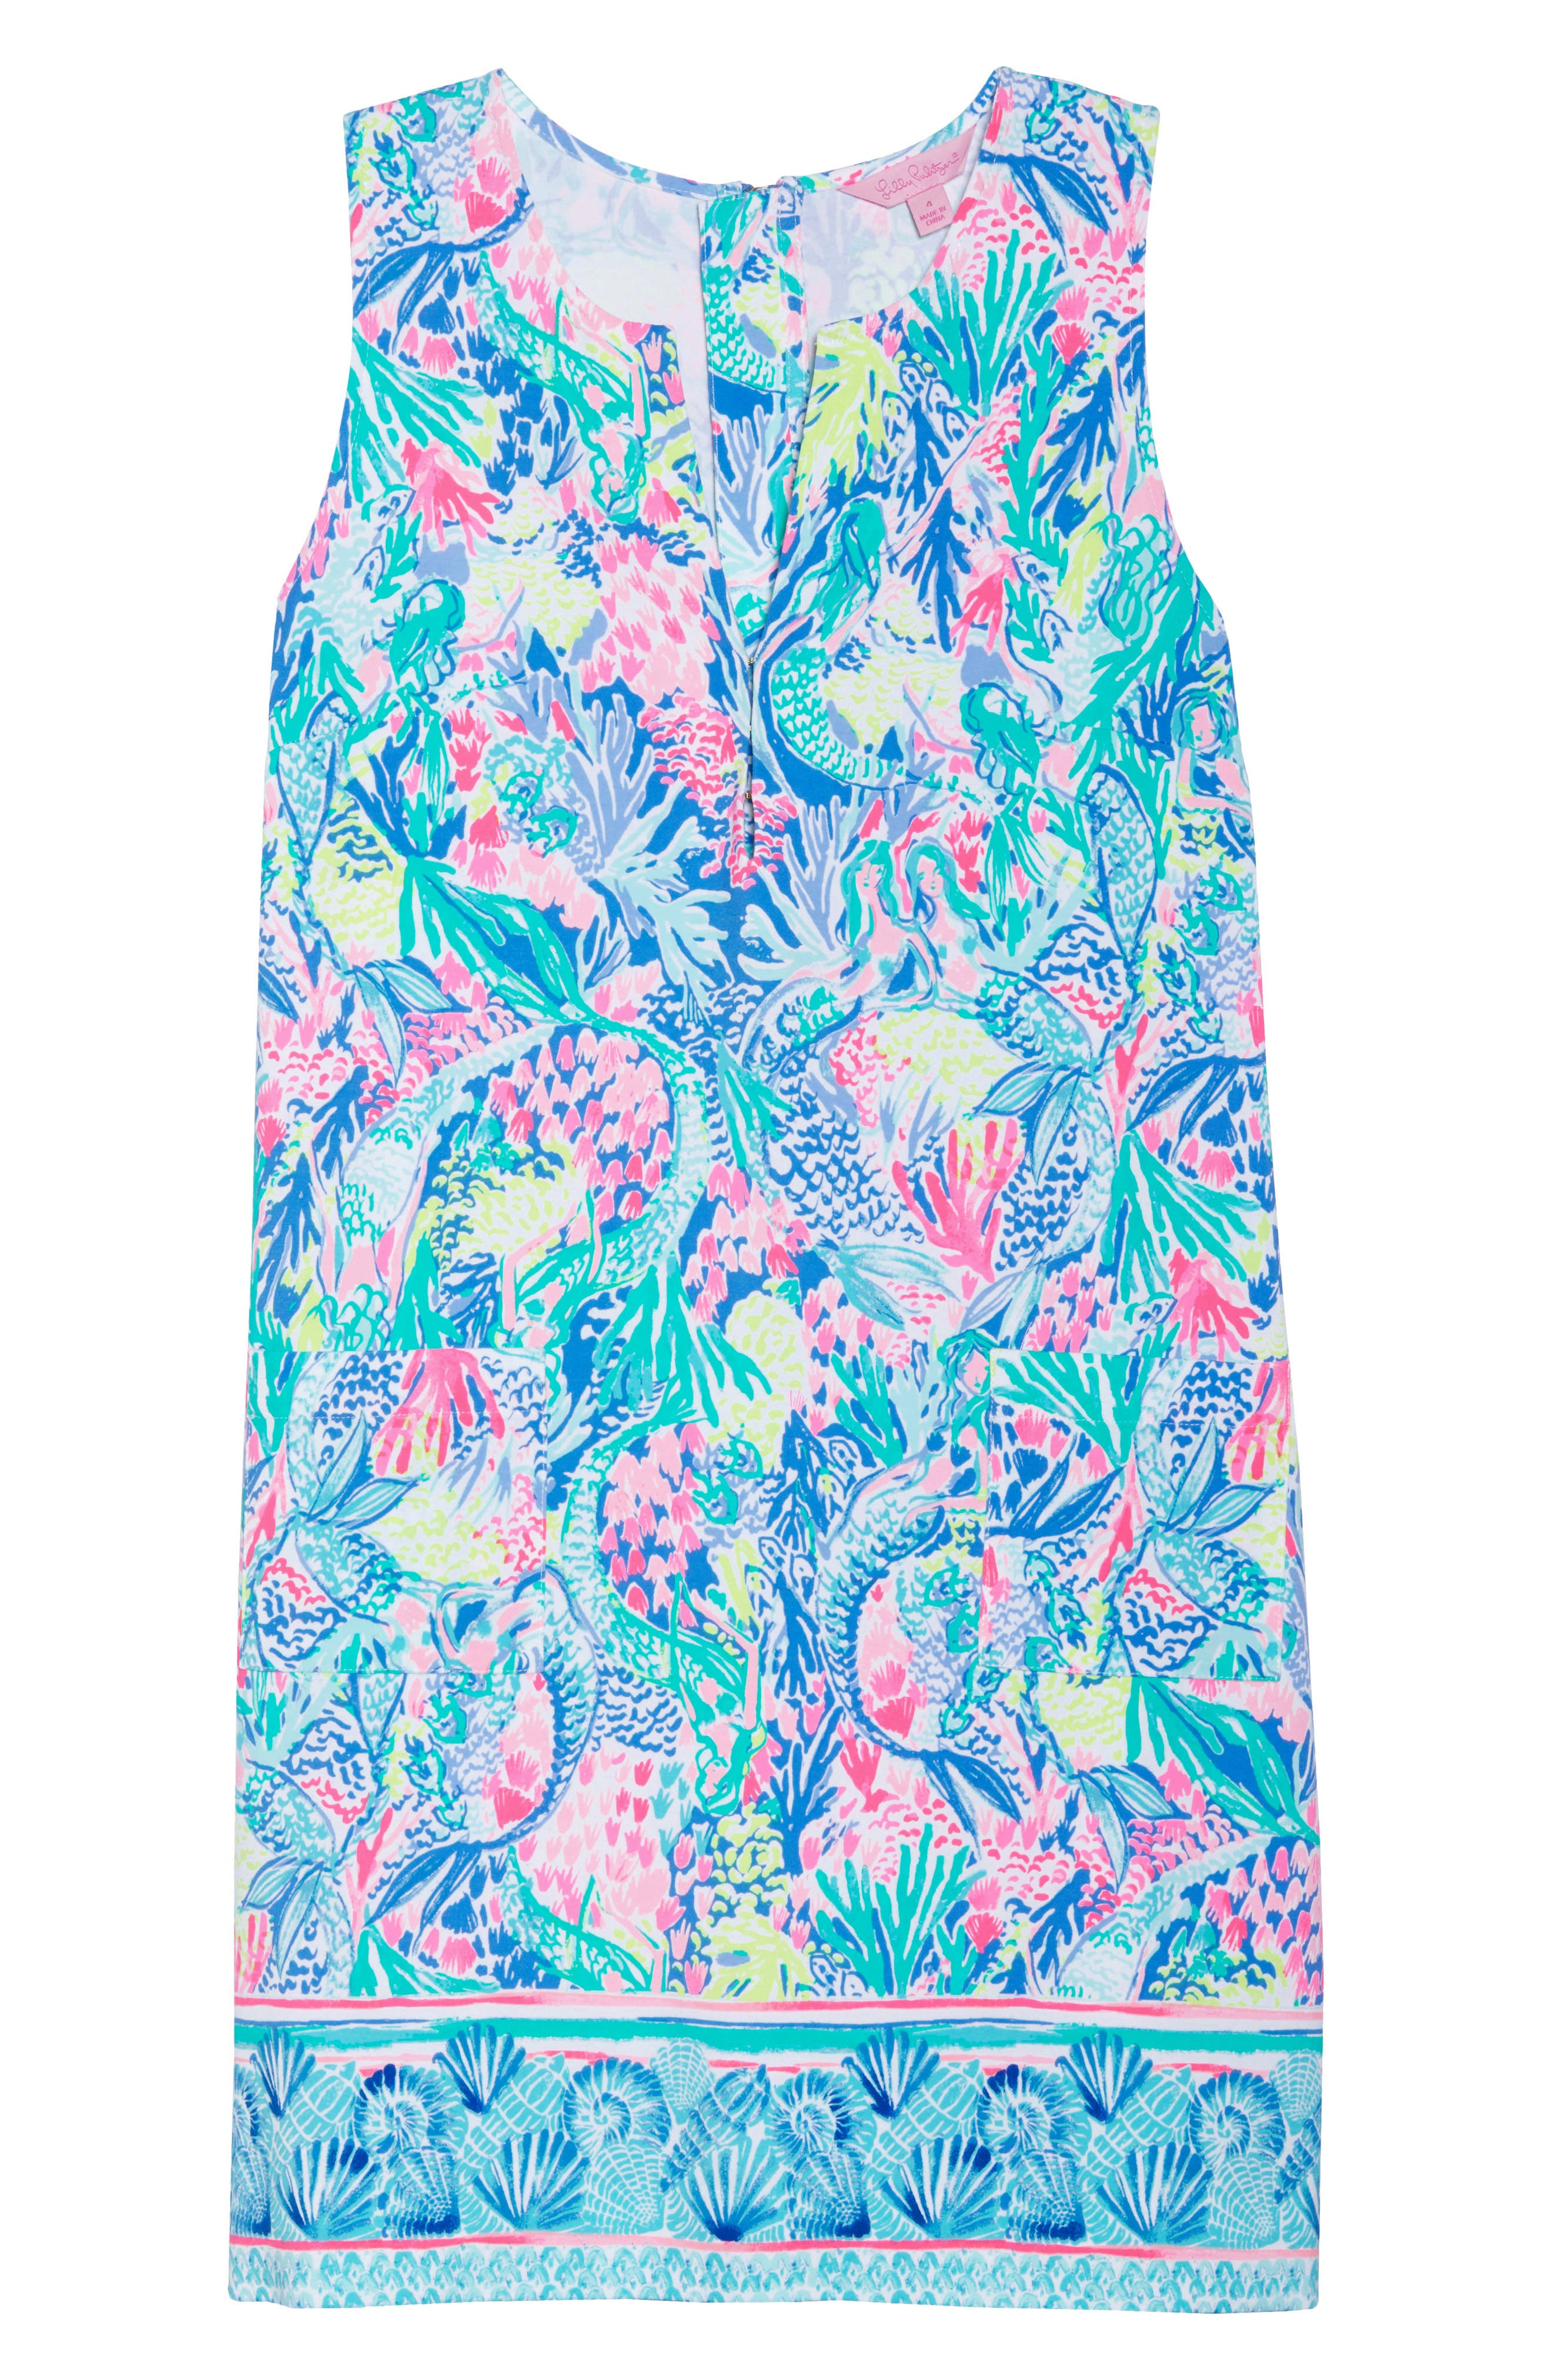 Kelby Stretch Shift Dress,                             Alternate thumbnail 6, color,                             Multi Mermaids Cove